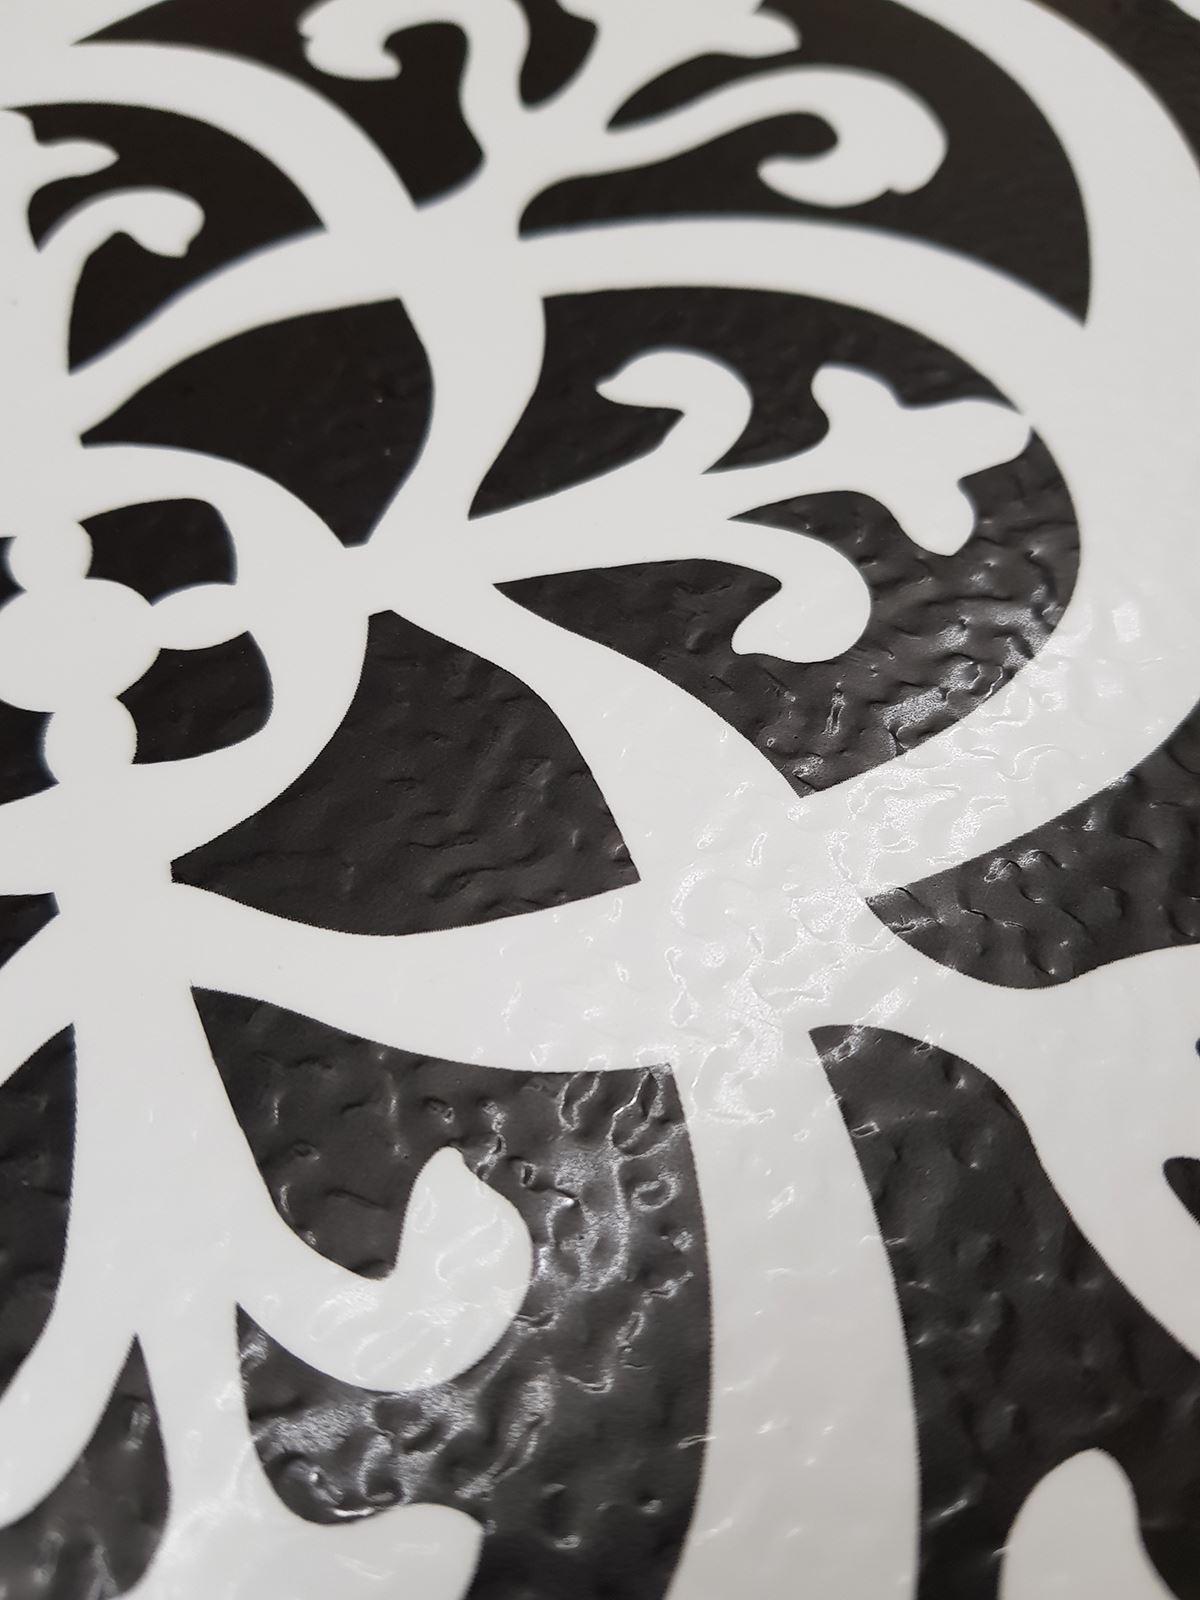 Peel Amp Stick Vinyl Floor Tiles 10pcs Marble Moroccan Floral Pattern Floorpops Ebay